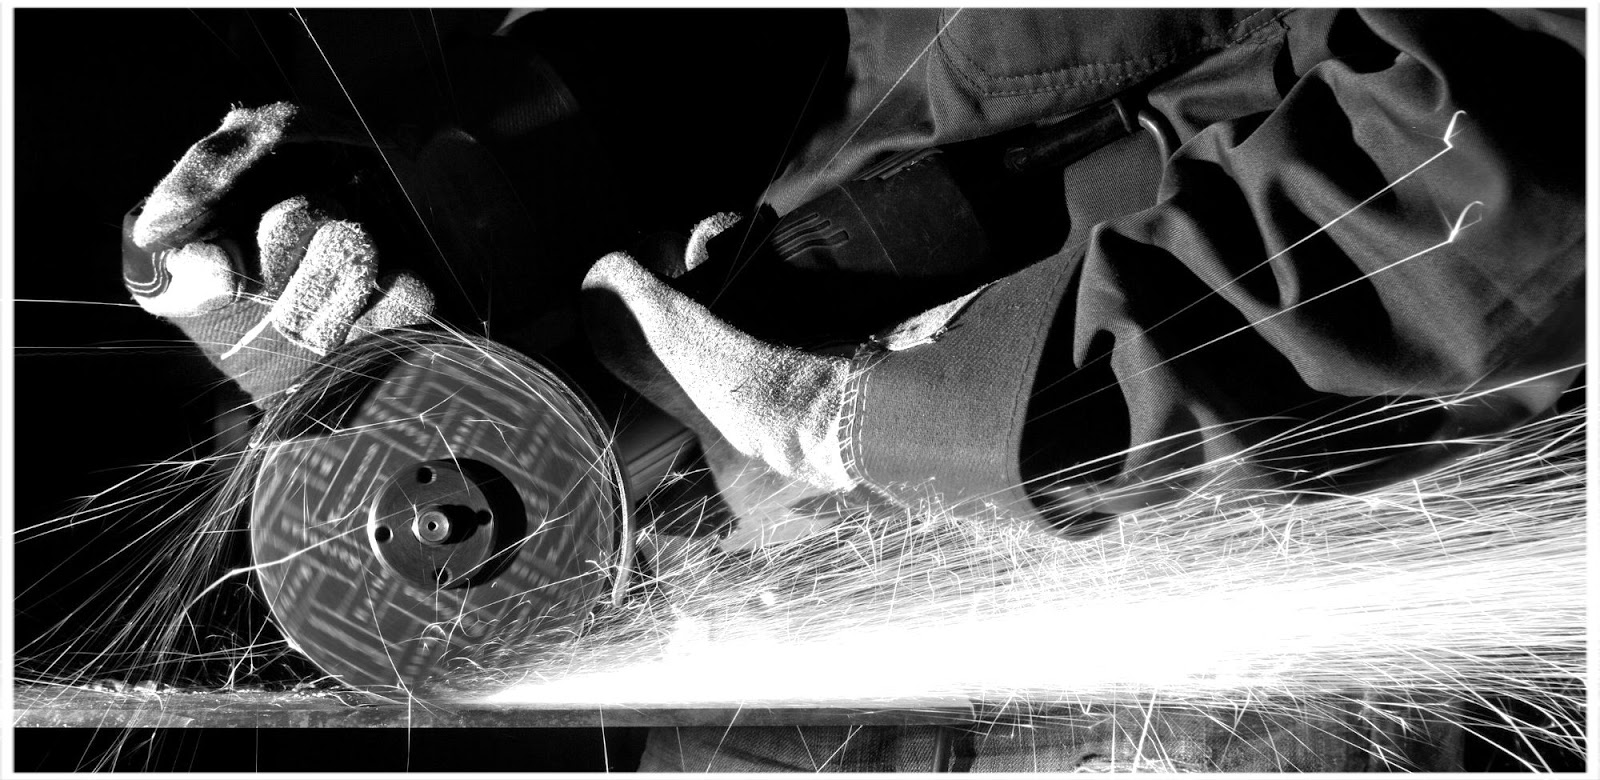 Concrete saw cutting tool